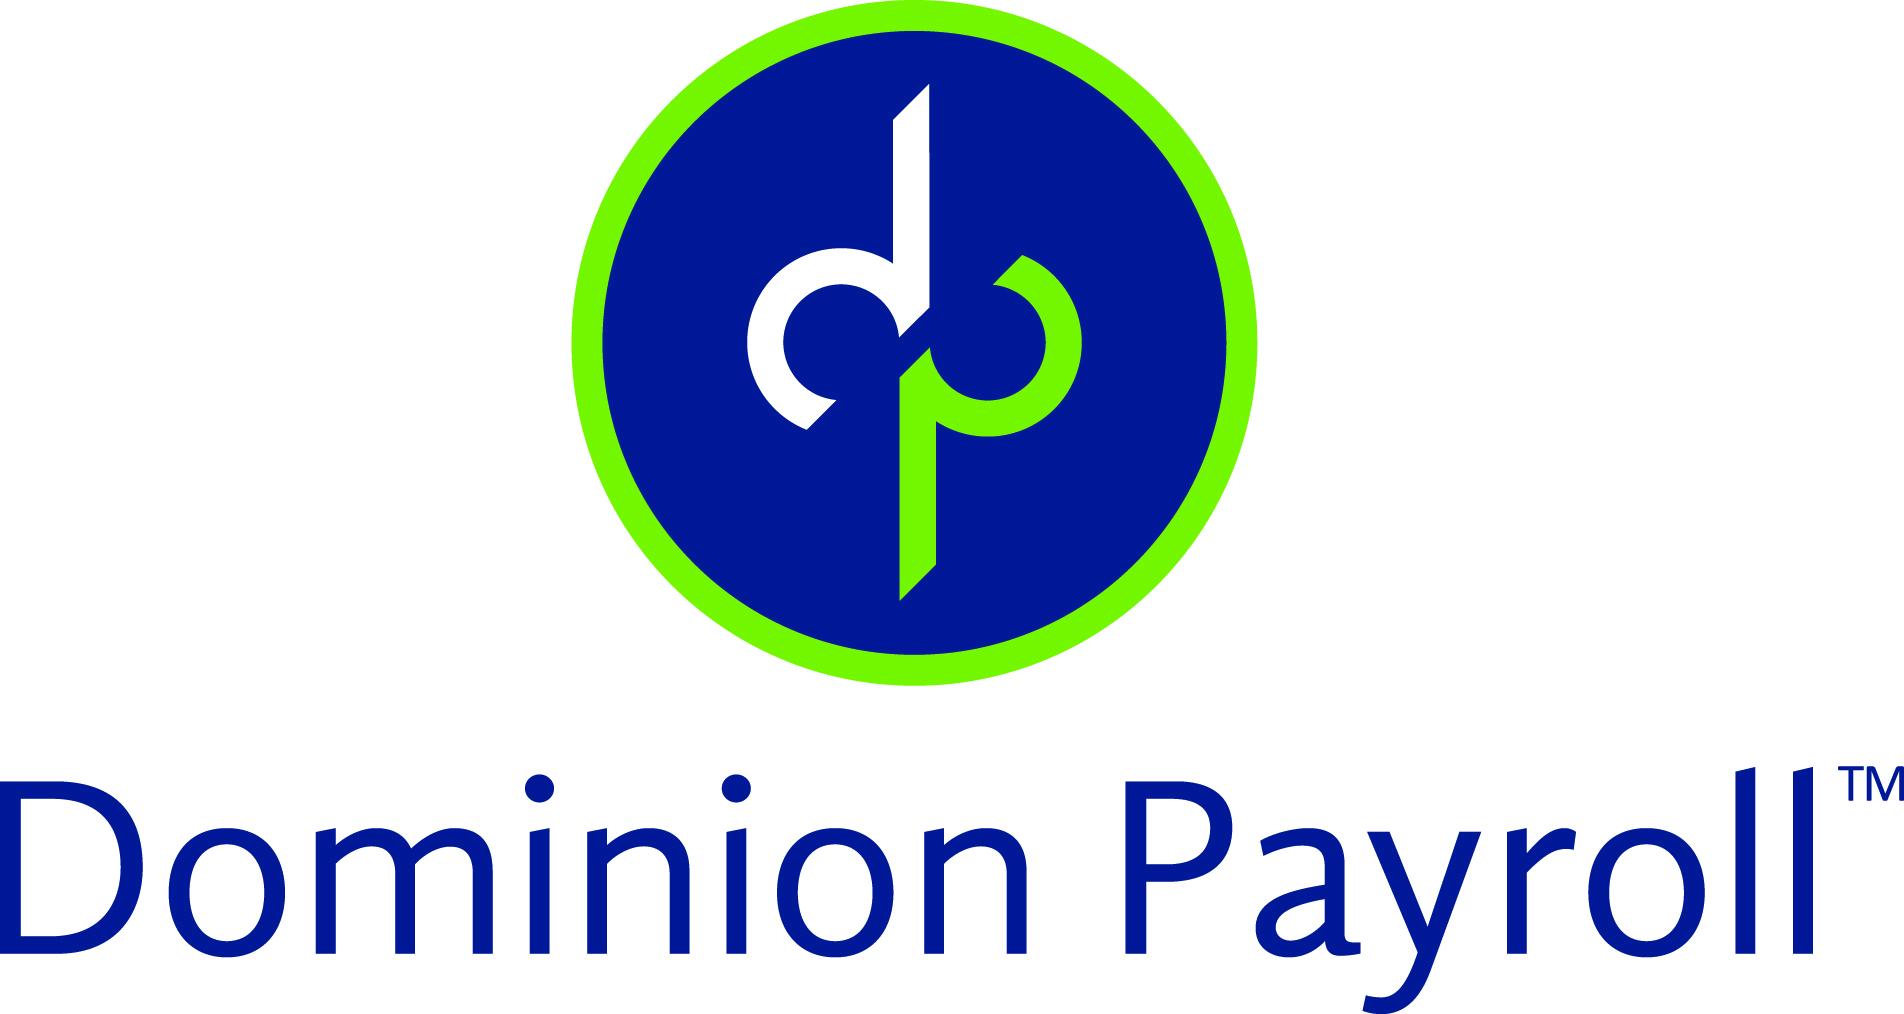 Dominion Payroll